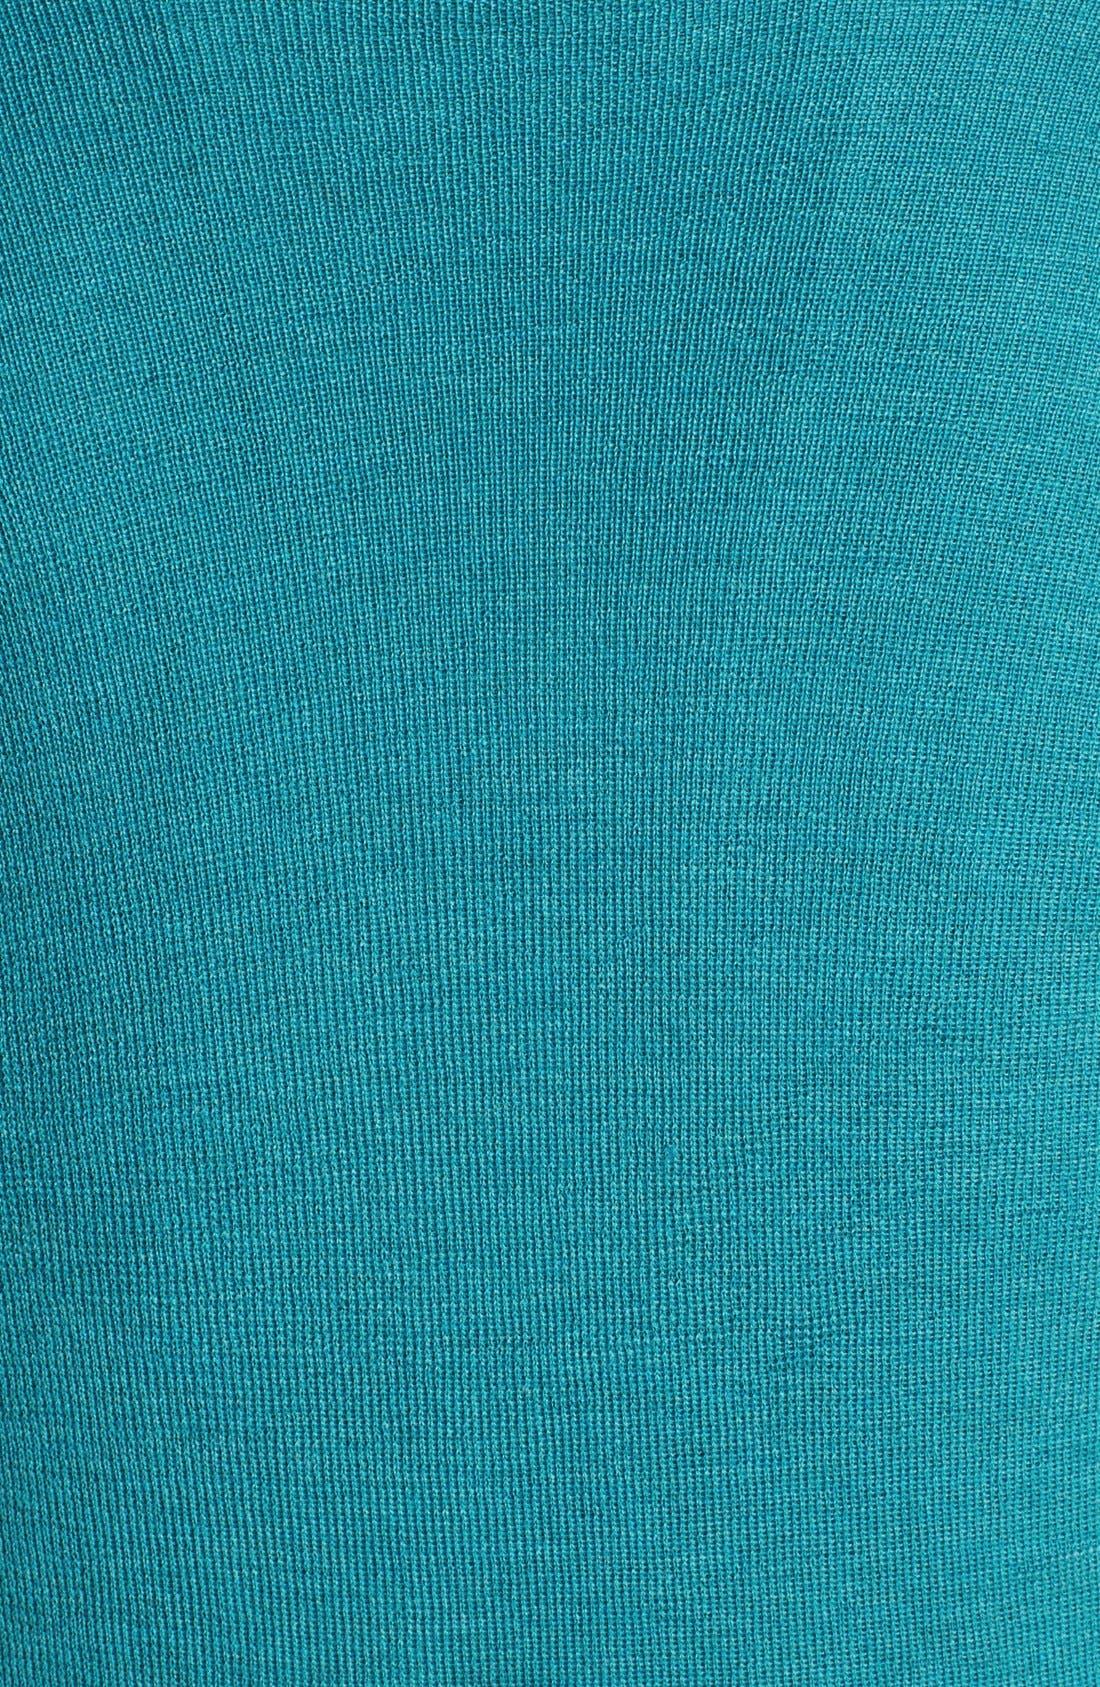 Alternate Image 3  - Eileen Fisher Draped Wool Top (Plus Size)